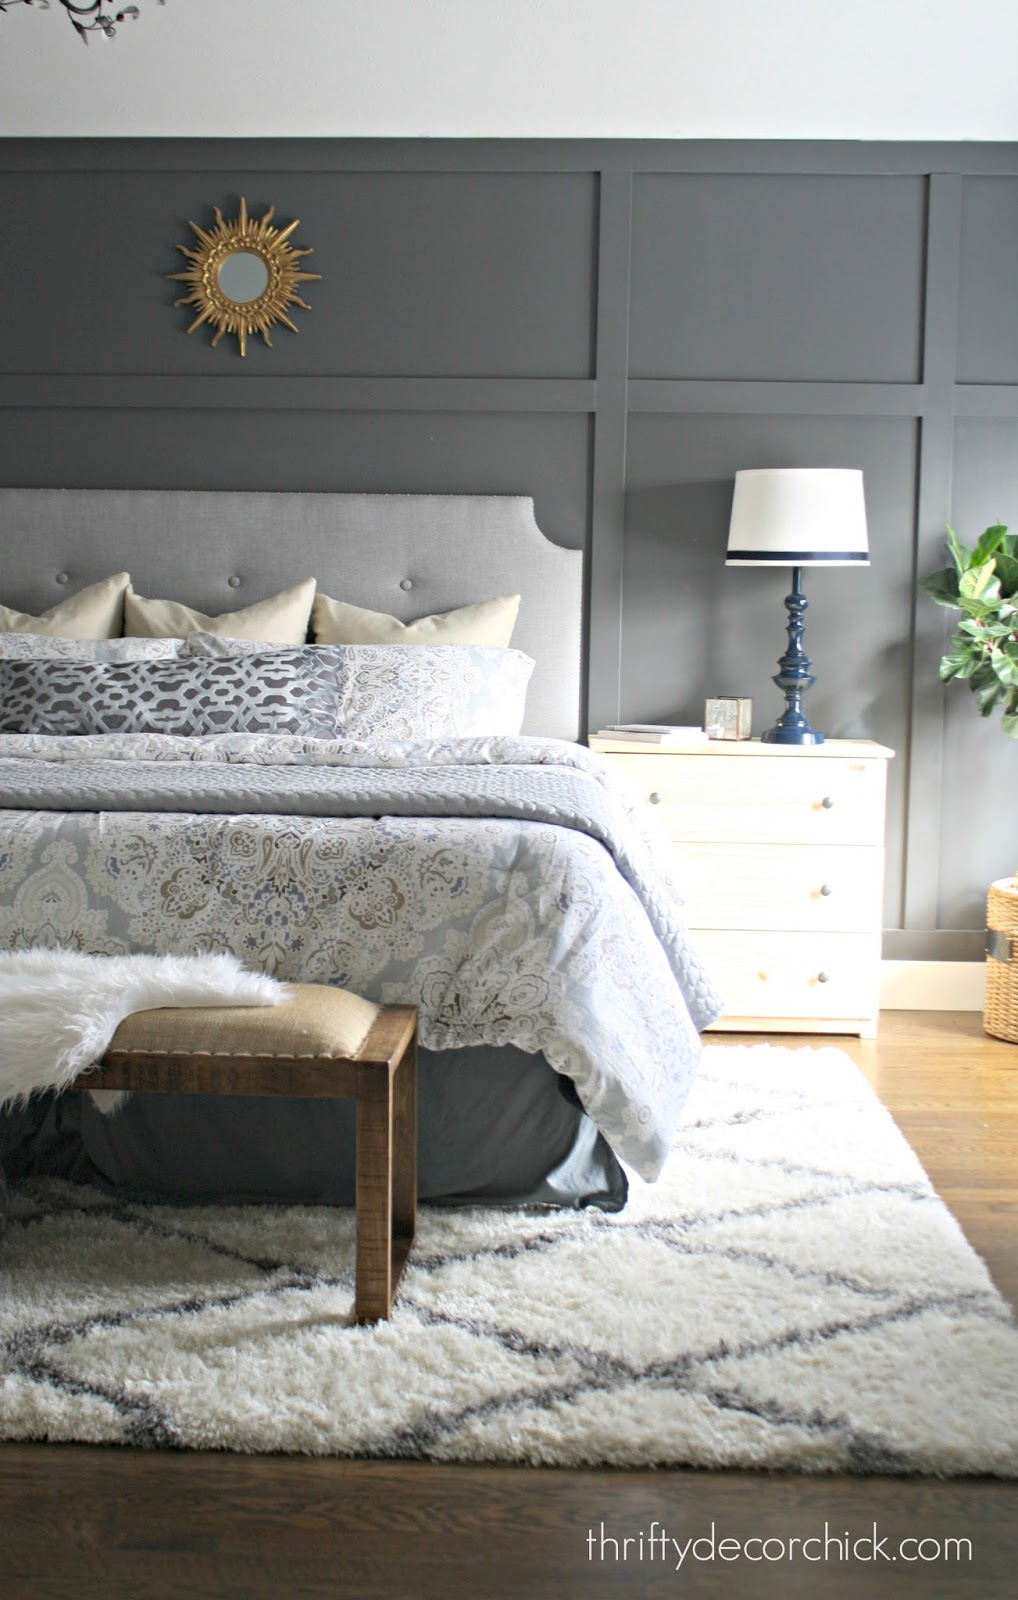 Fresh Tarva IKEA dresser as nightstand